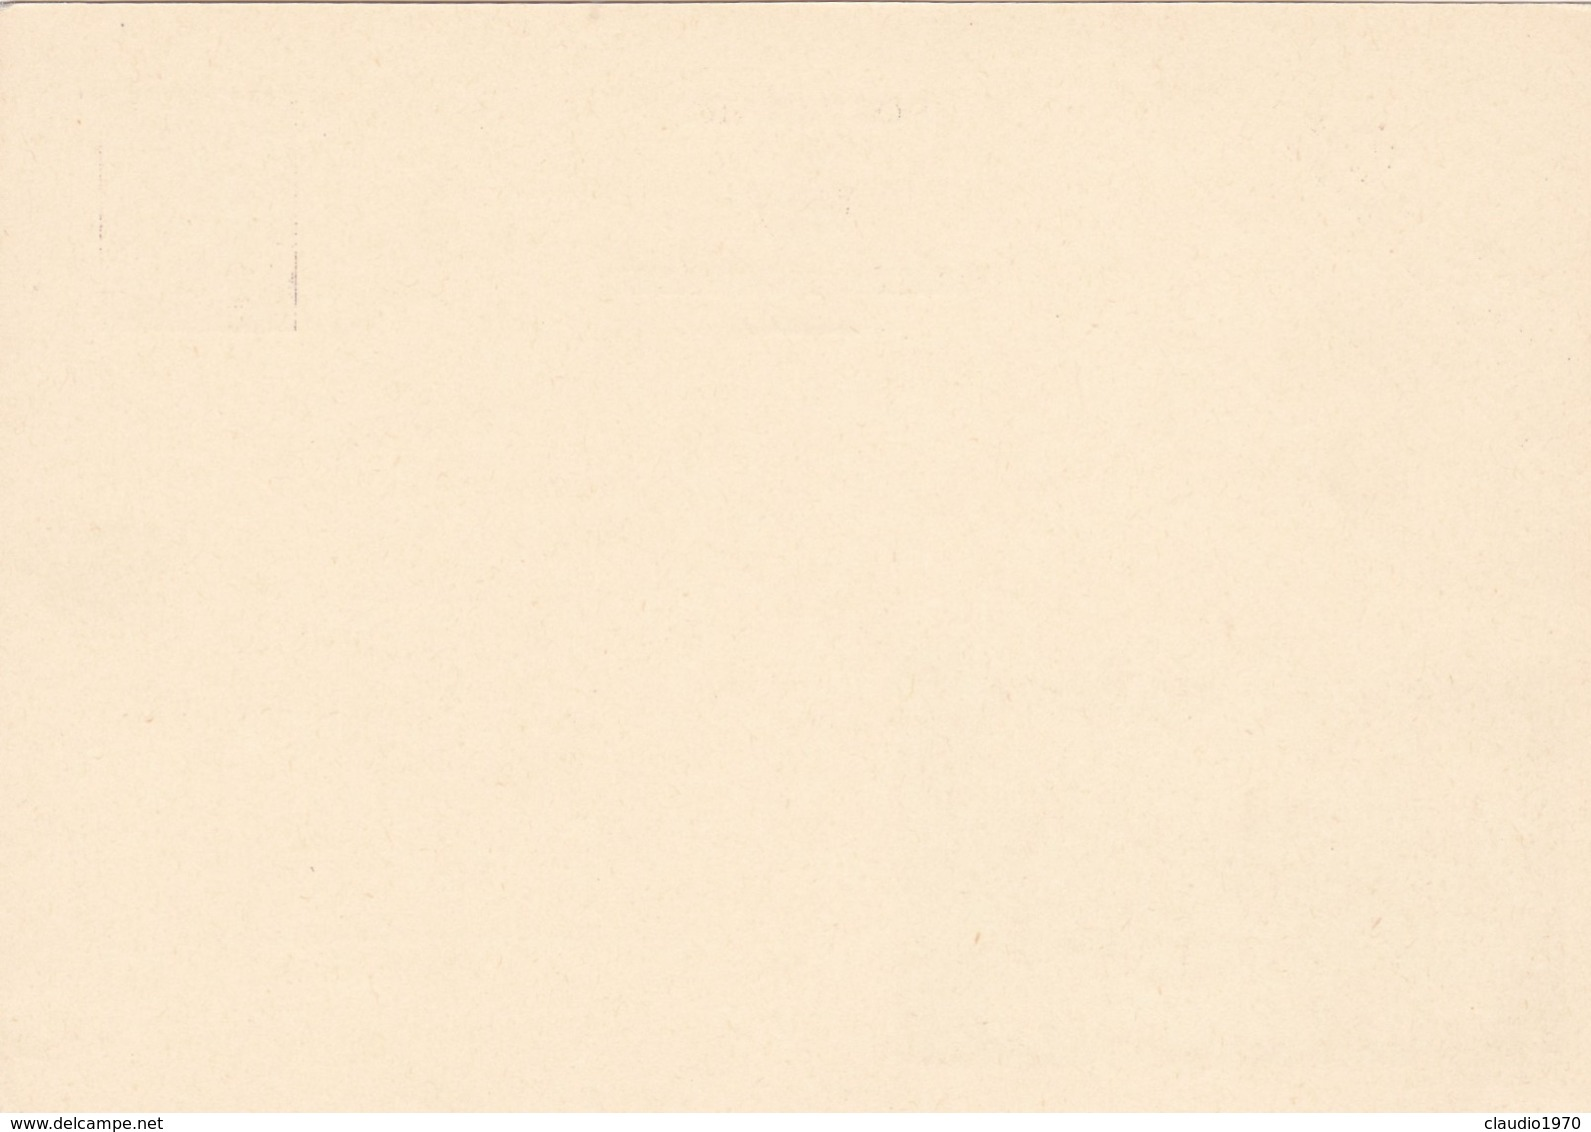 BELGIO - STORIA POSTALE NON VIAGGIATA - BELGIO - INTERO POSTALE 90 C. - VISITEZ - BEZOEKT - HUIZINGEN - Stamped Stationery